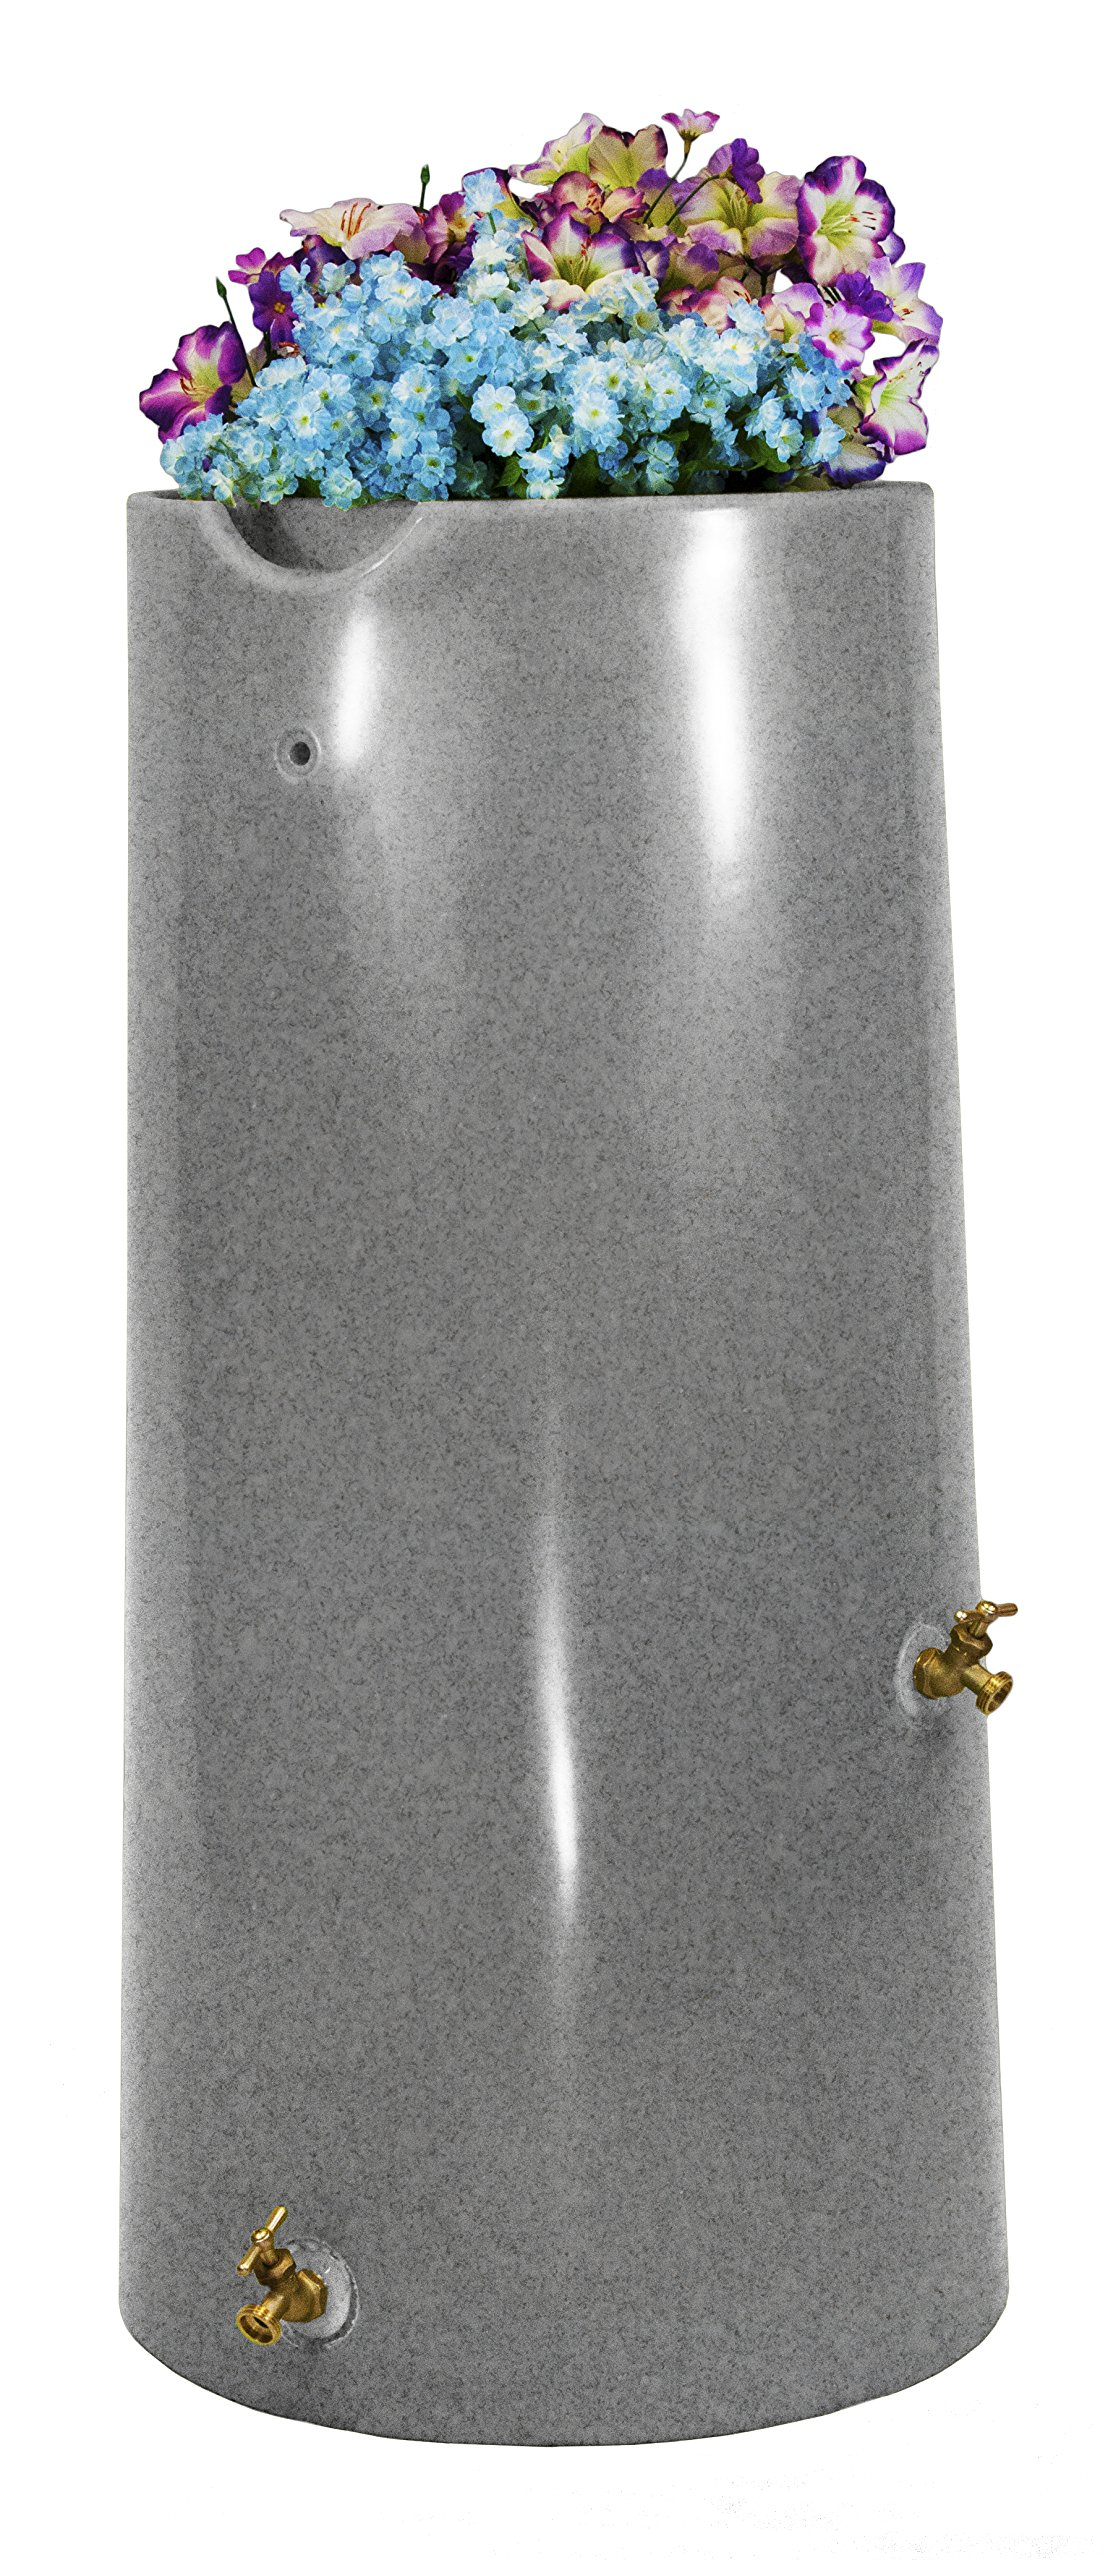 Good Ideas IMP-R50-LIG Impressions Reflections Rain Saver Rain Barrel, 50 gallon, Light Granite